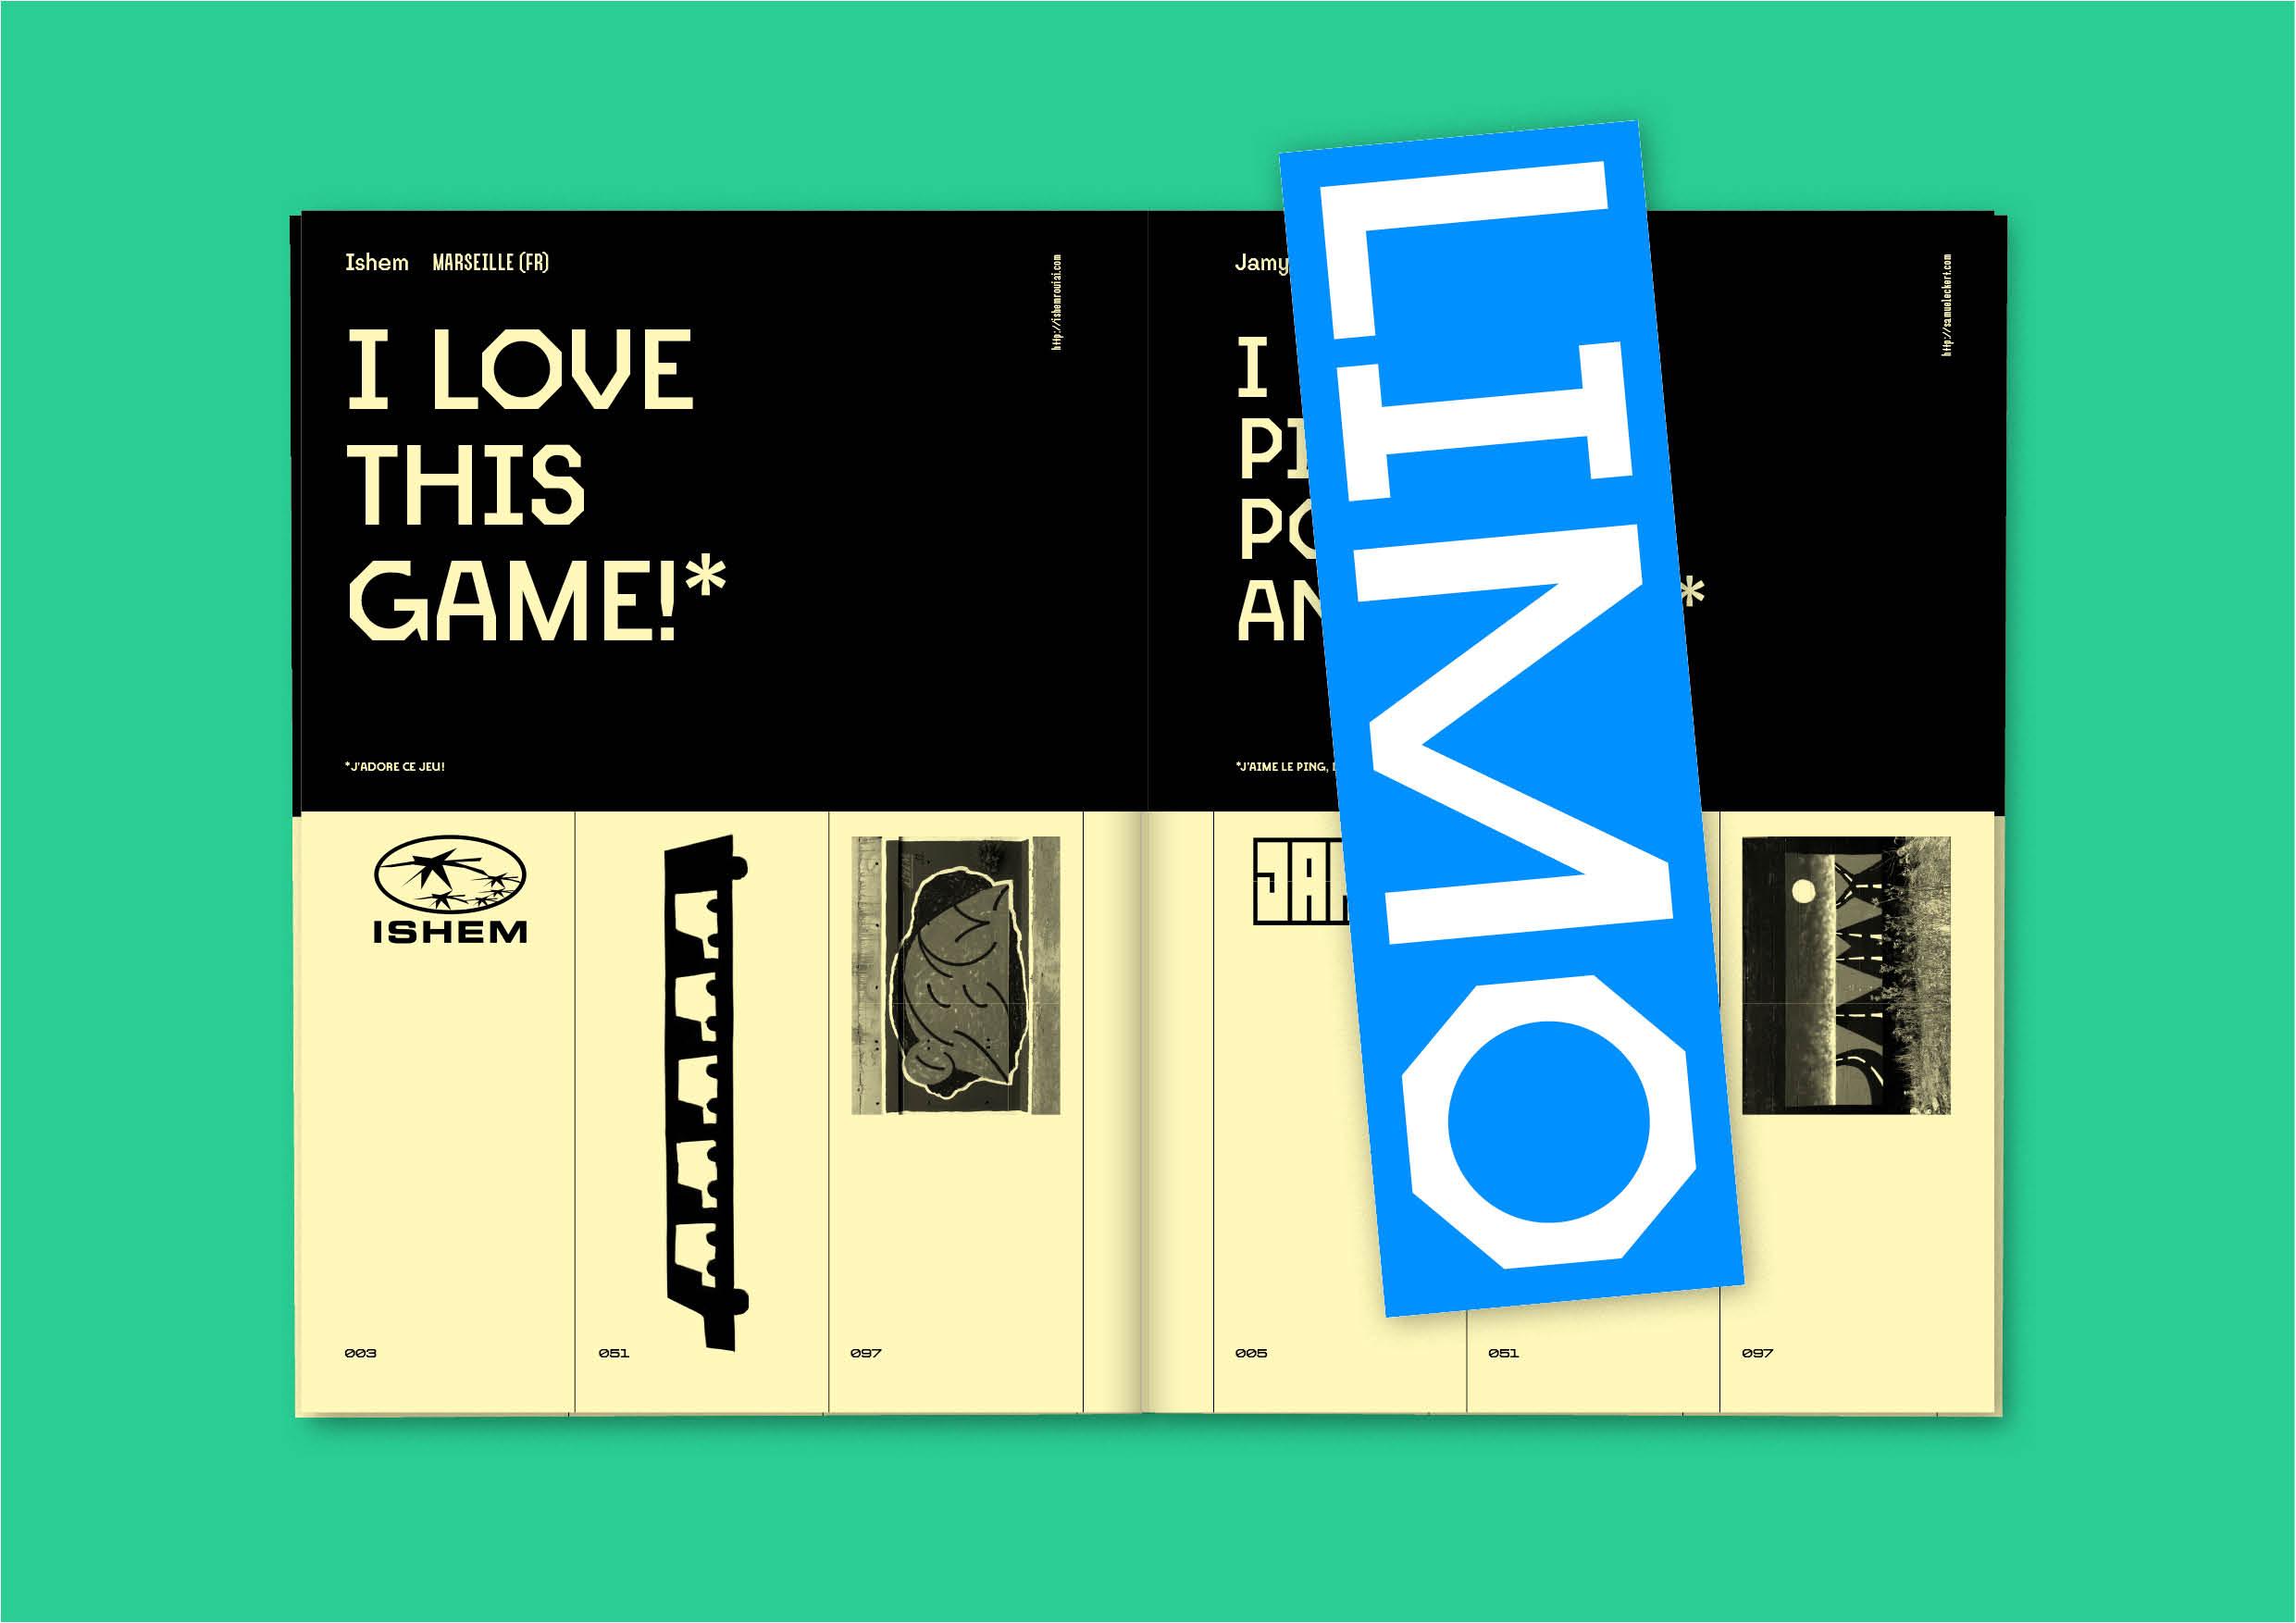 02 LIMO-MOKUP-complet74